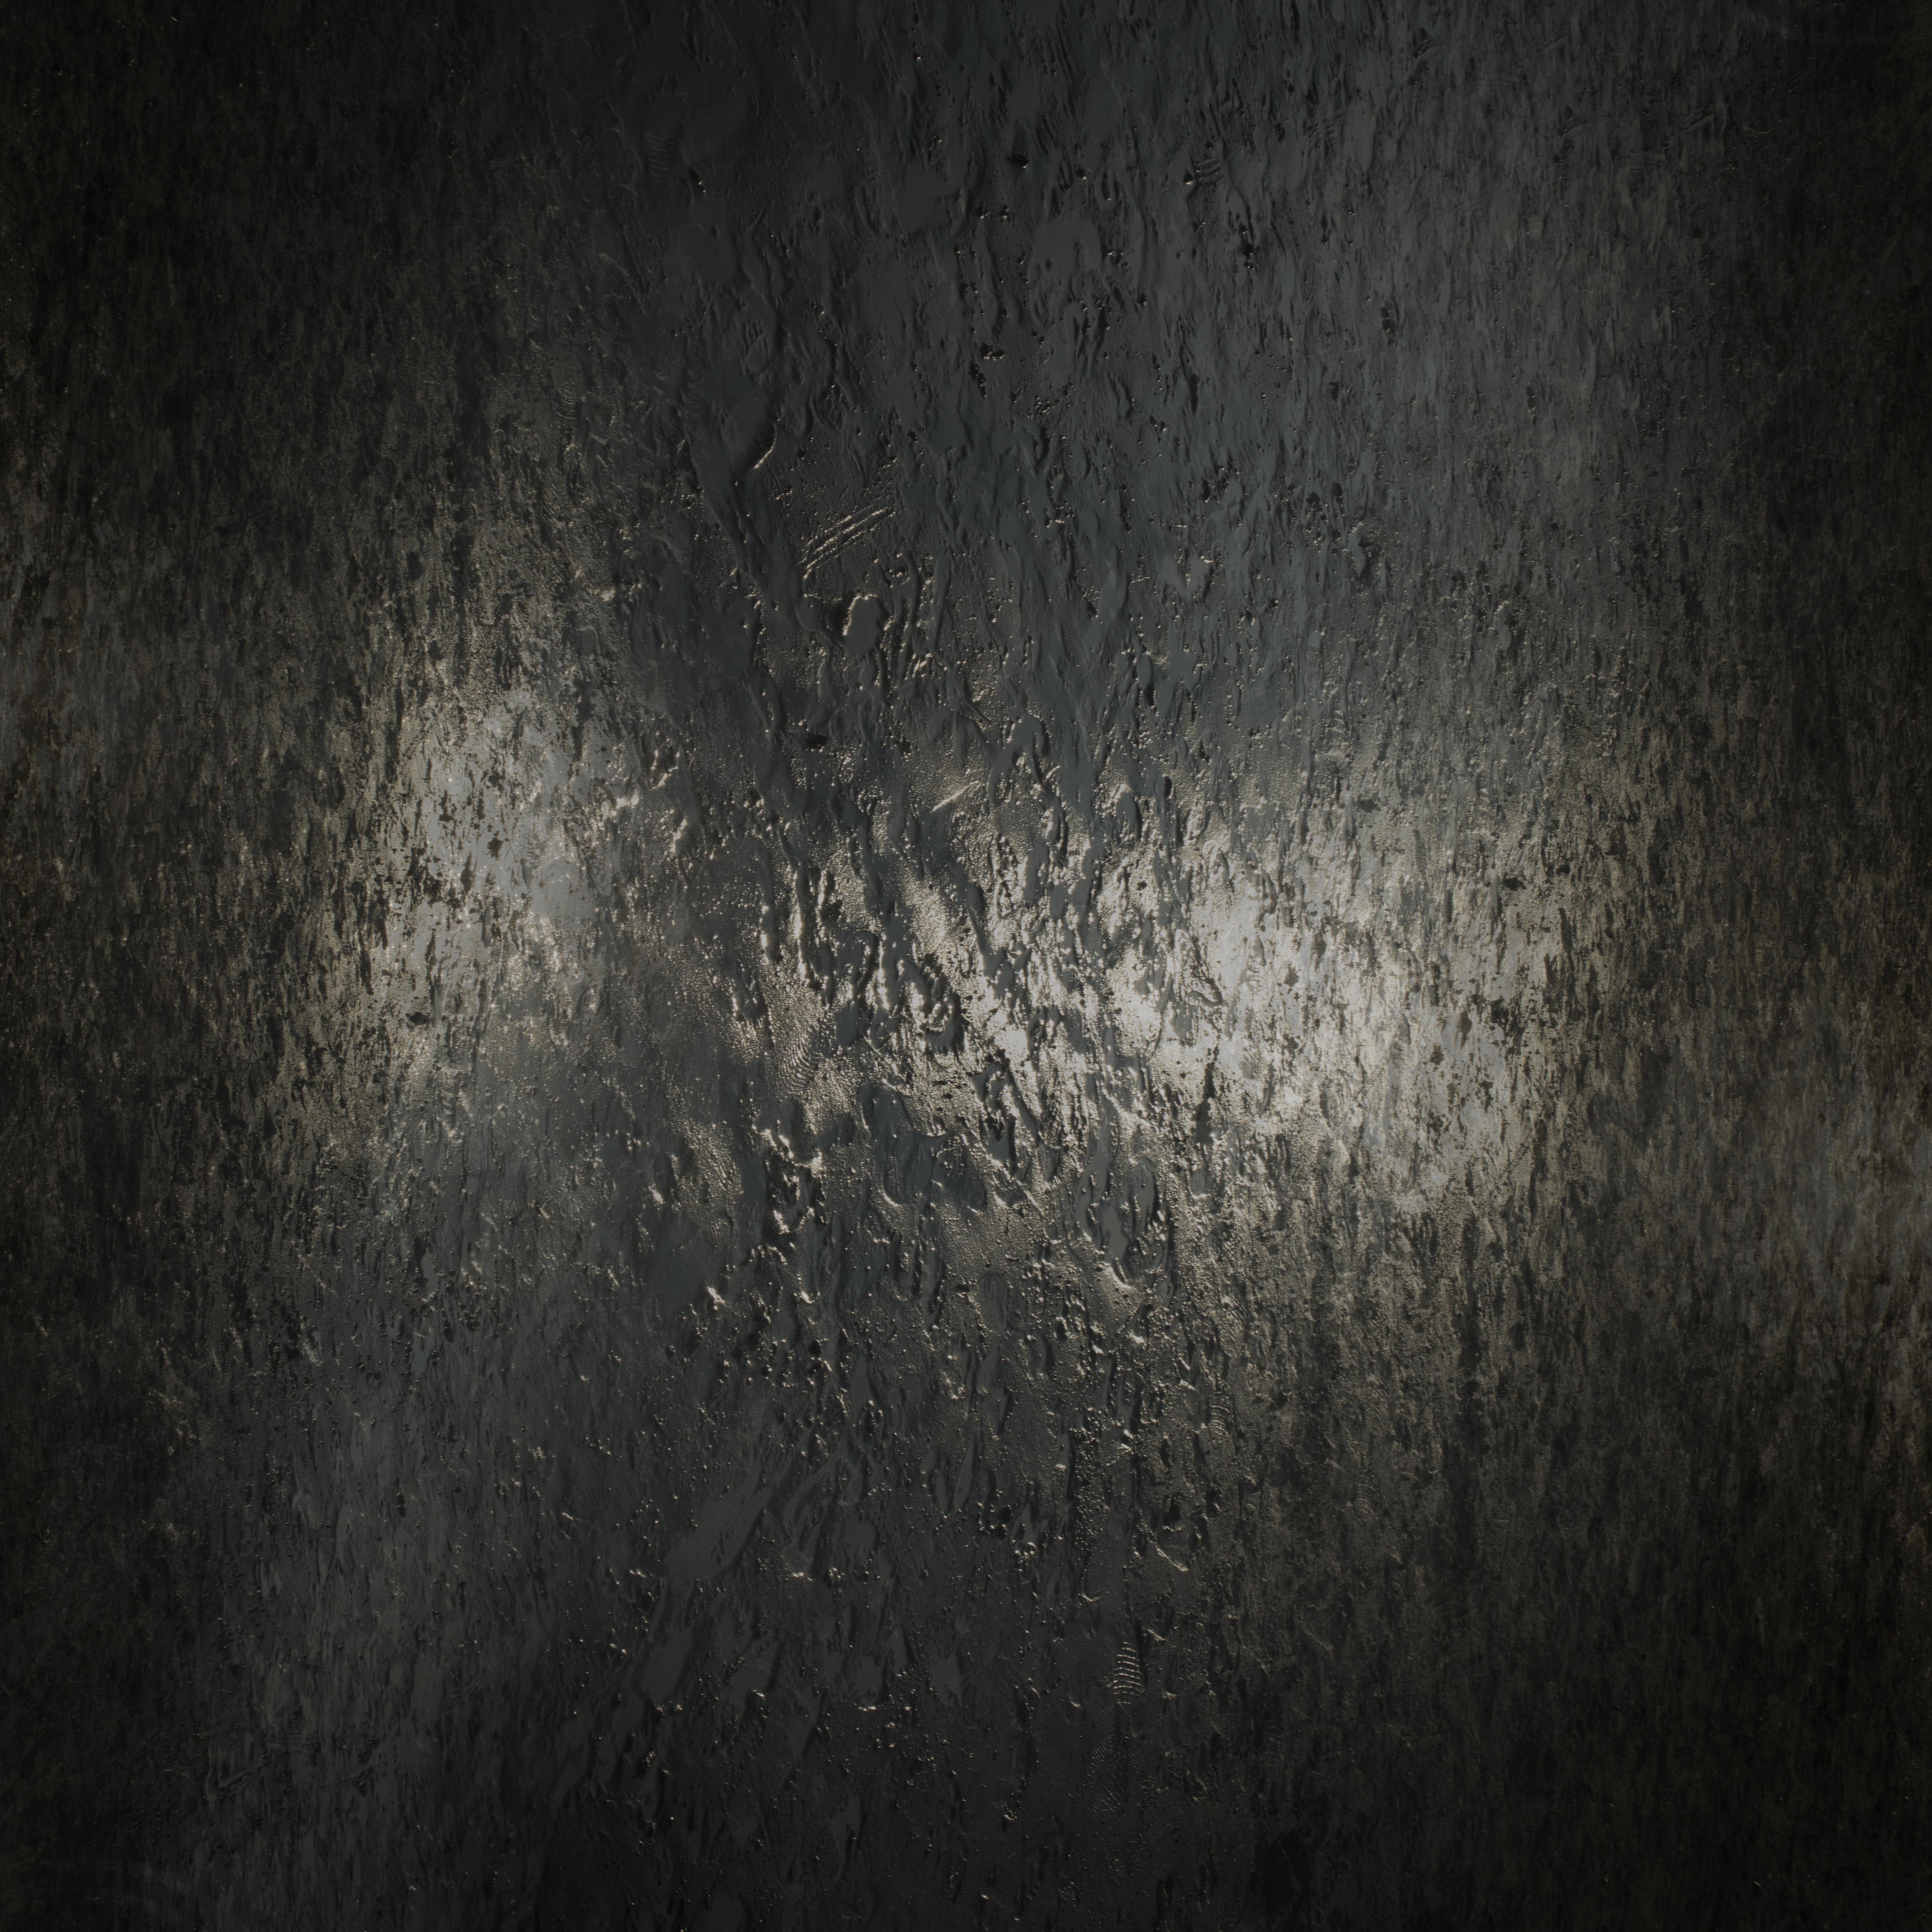 Untitled-2 2